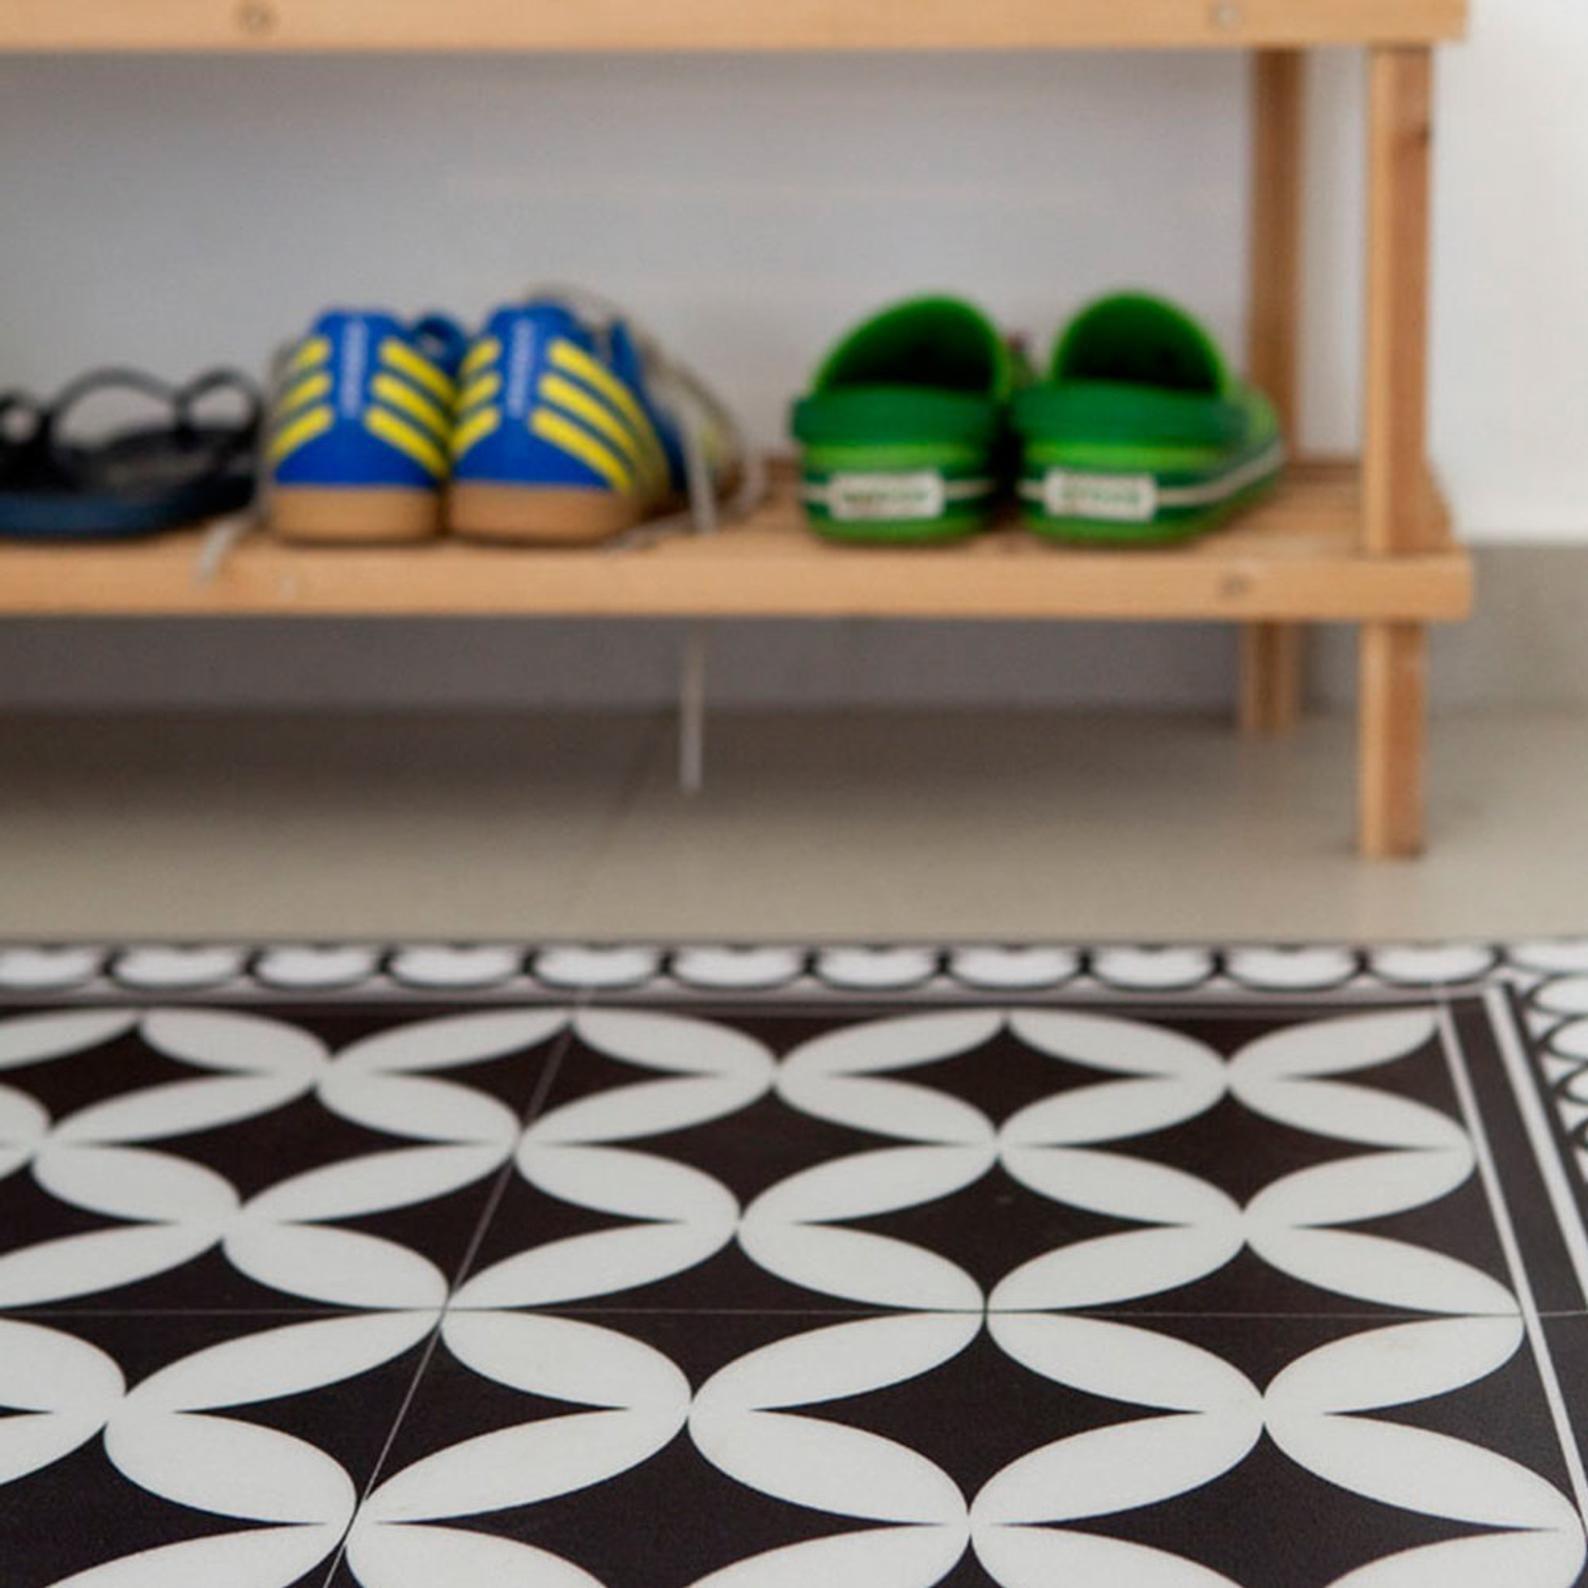 Kitchen Floor Mats Comfort And Ergonomic Type Of Mats In 2020 Carpet Tiles Tile Patterns Kitchen Mats Floor